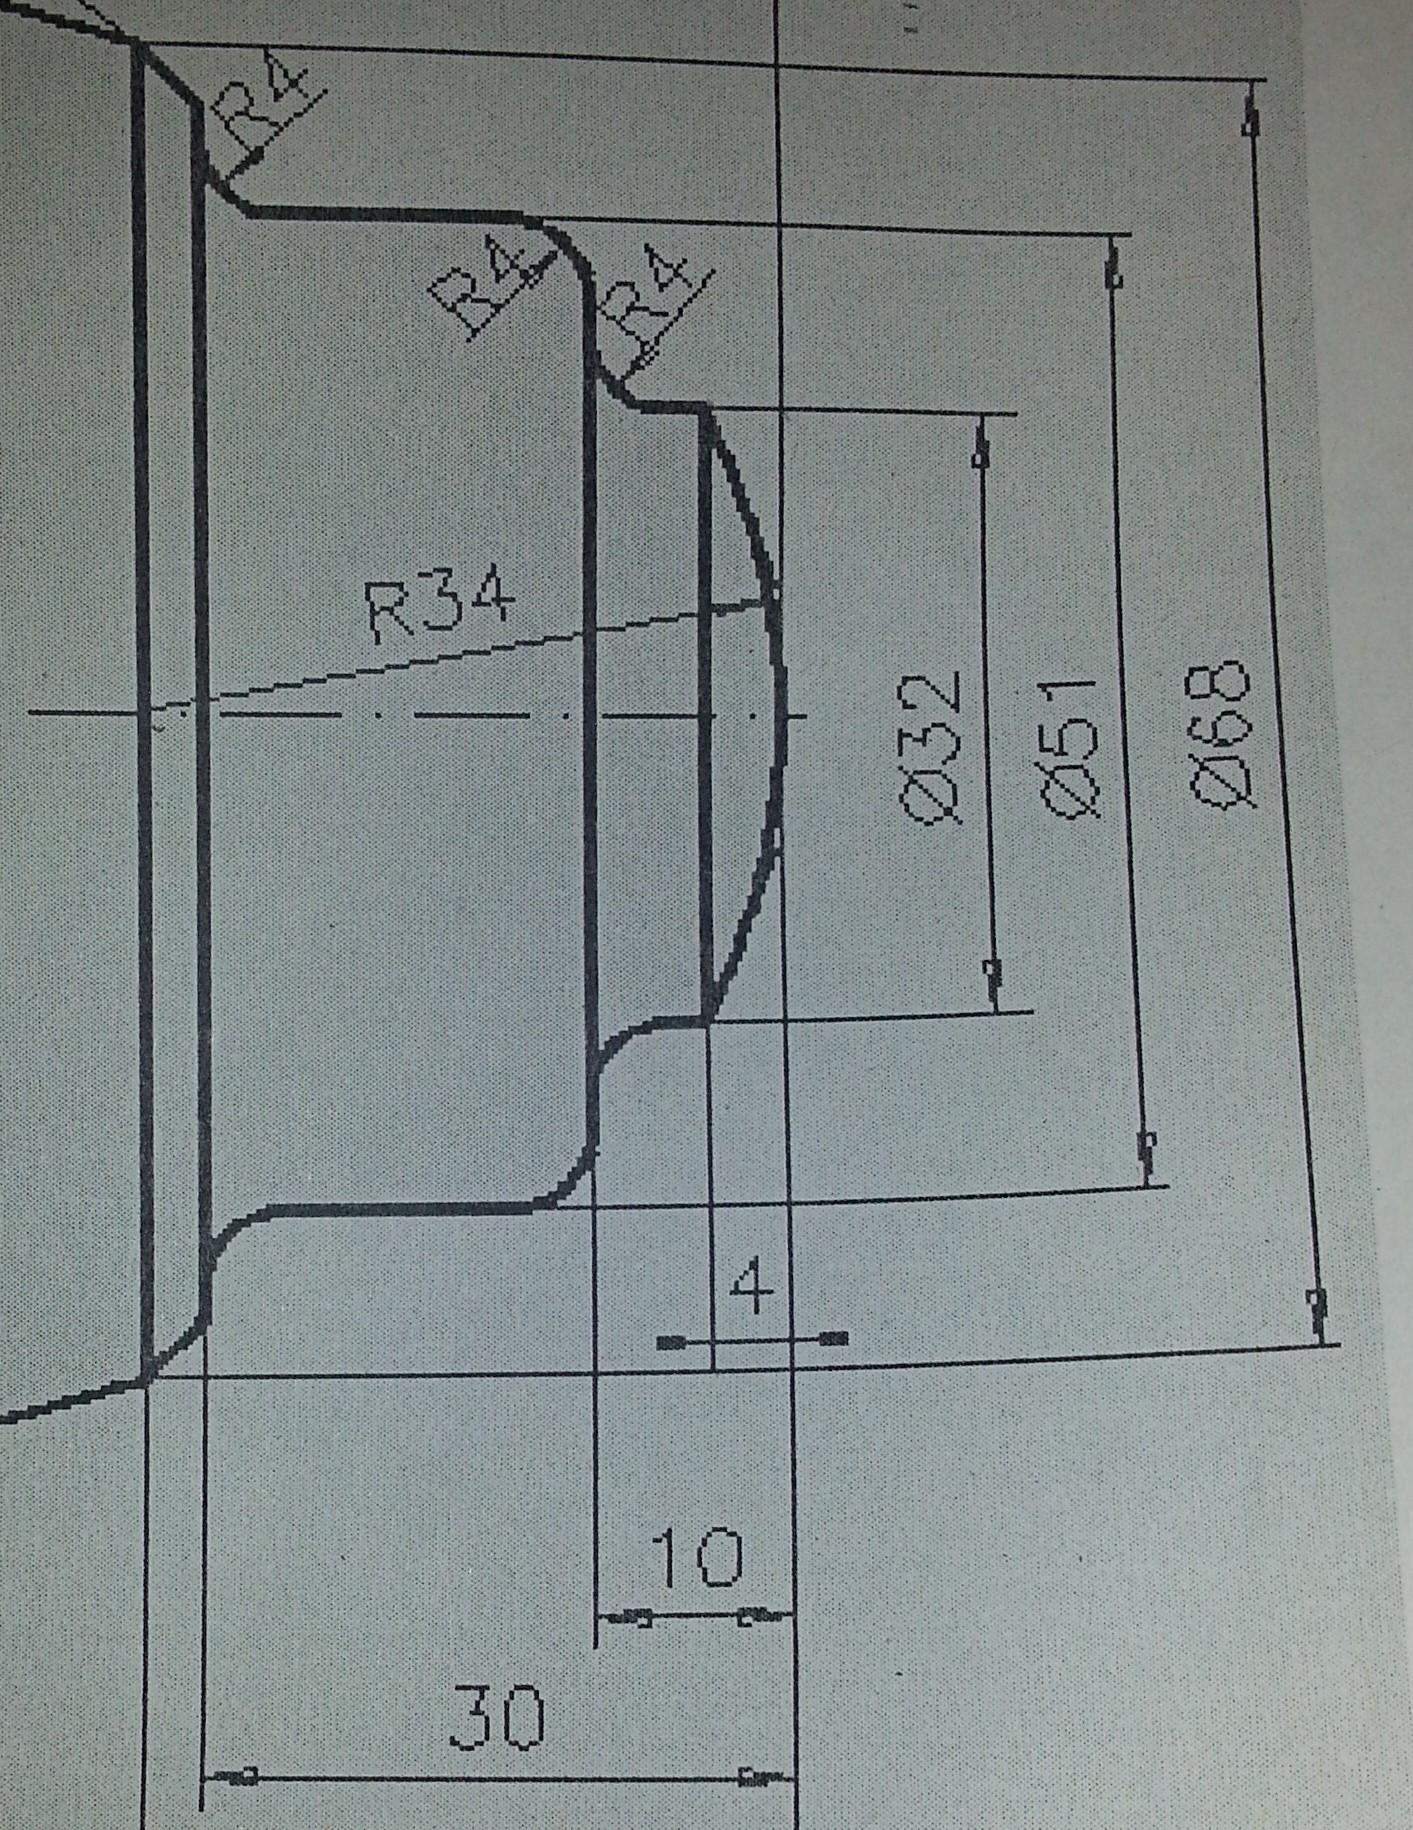 kreismittelpunkt berechnen kreismittelpunkt konstruieren. Black Bedroom Furniture Sets. Home Design Ideas